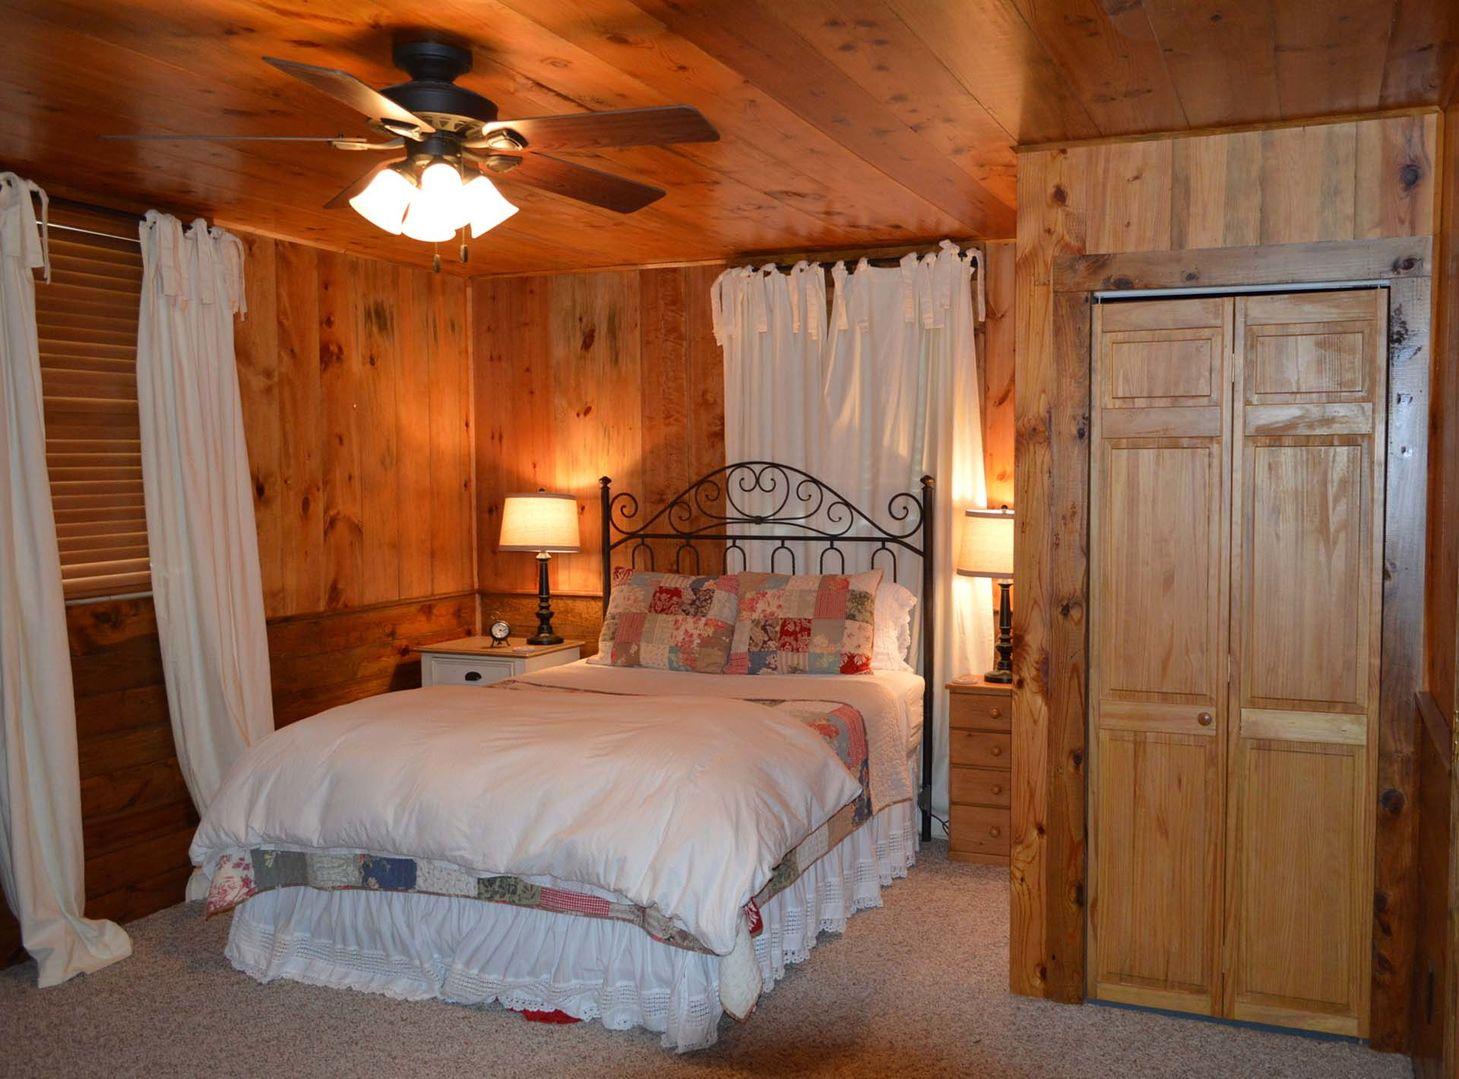 Bedroom downstairs with queen bed